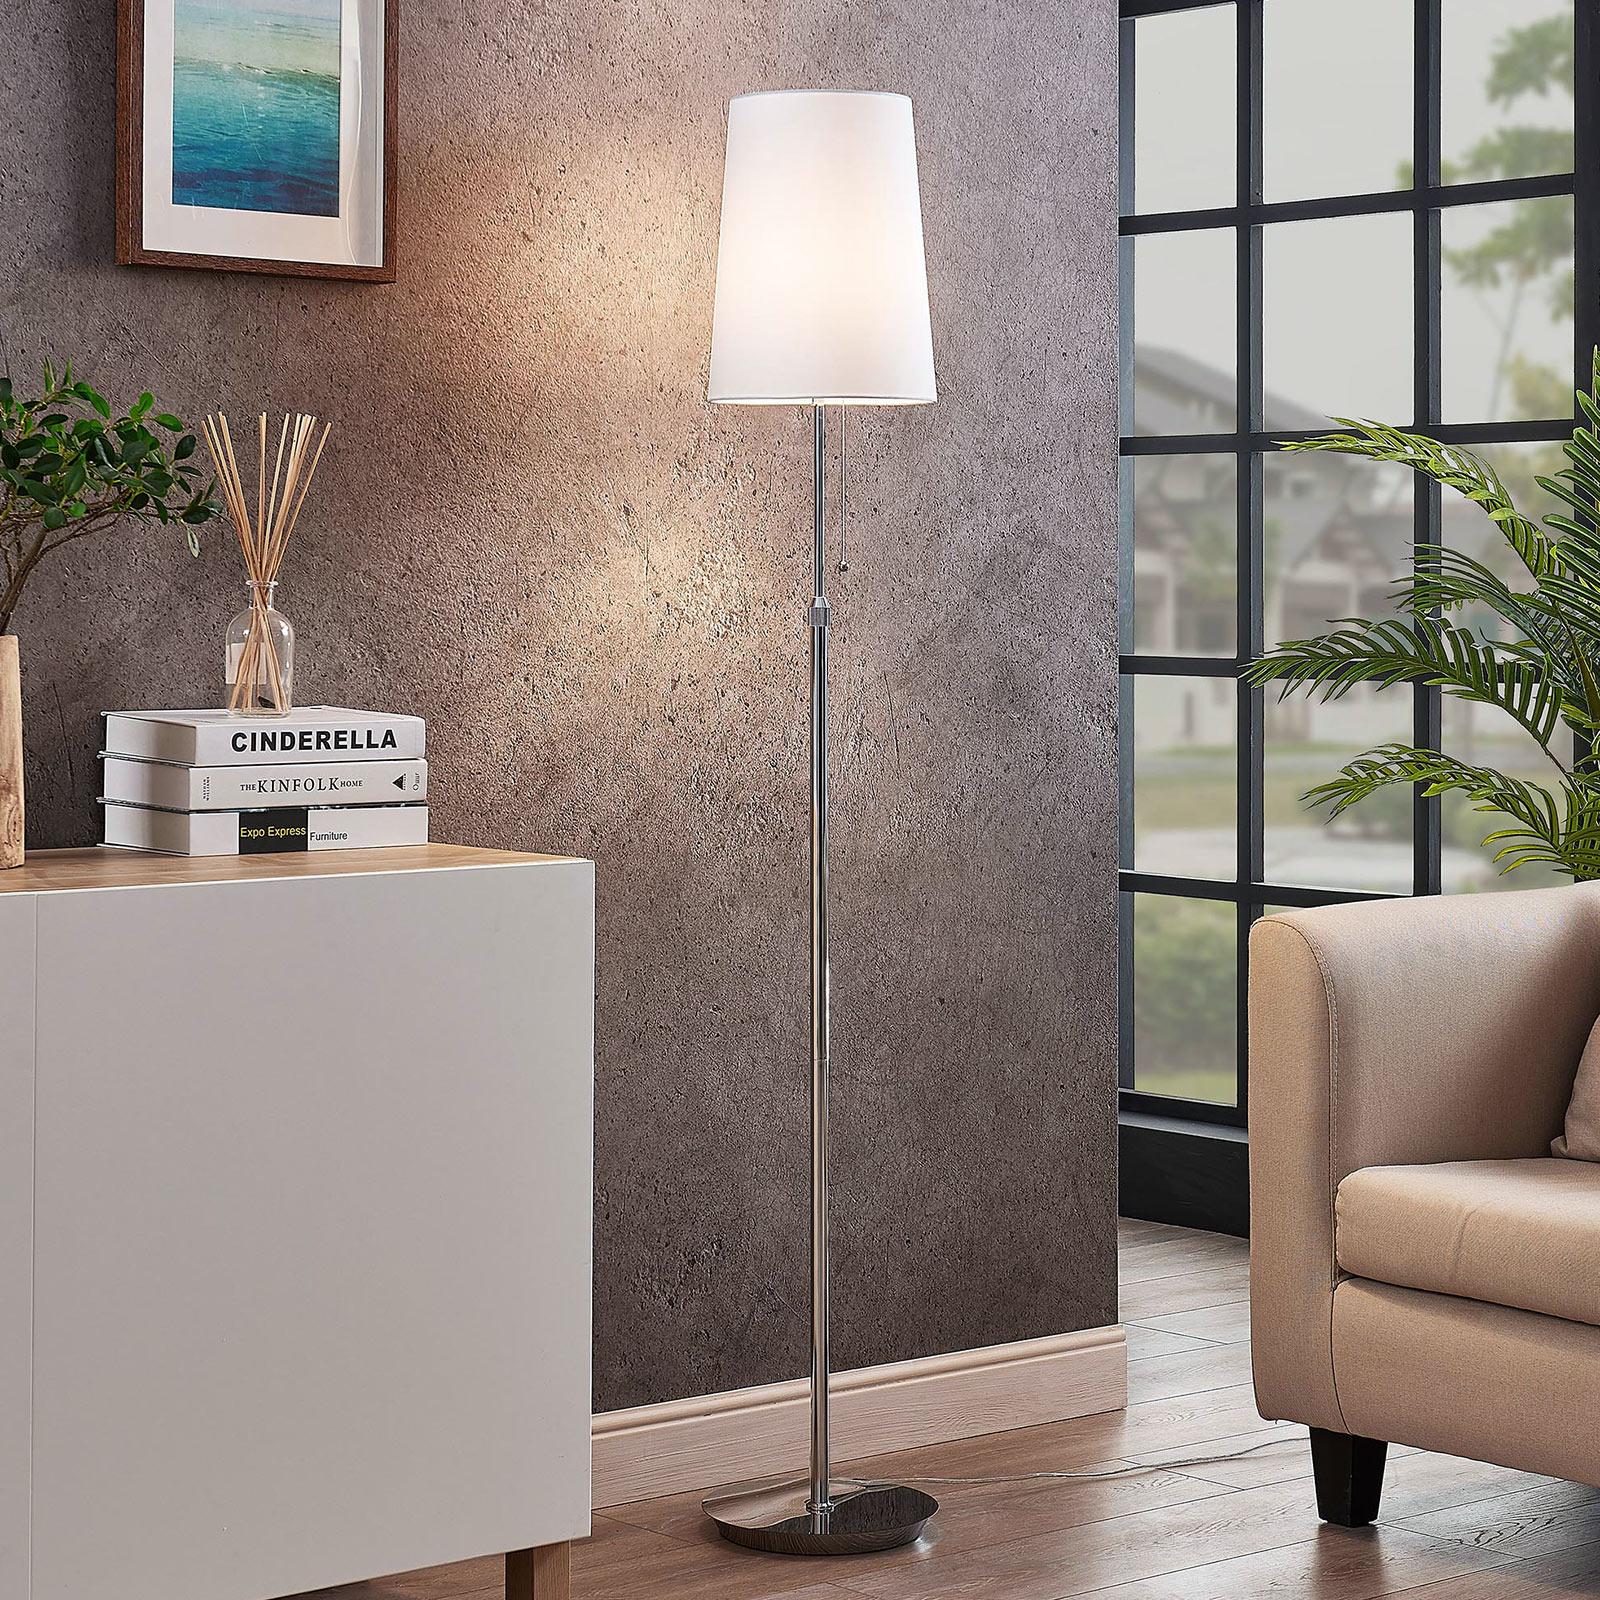 Lucande Pordis vloerlamp, 164 cm, chroom-wit